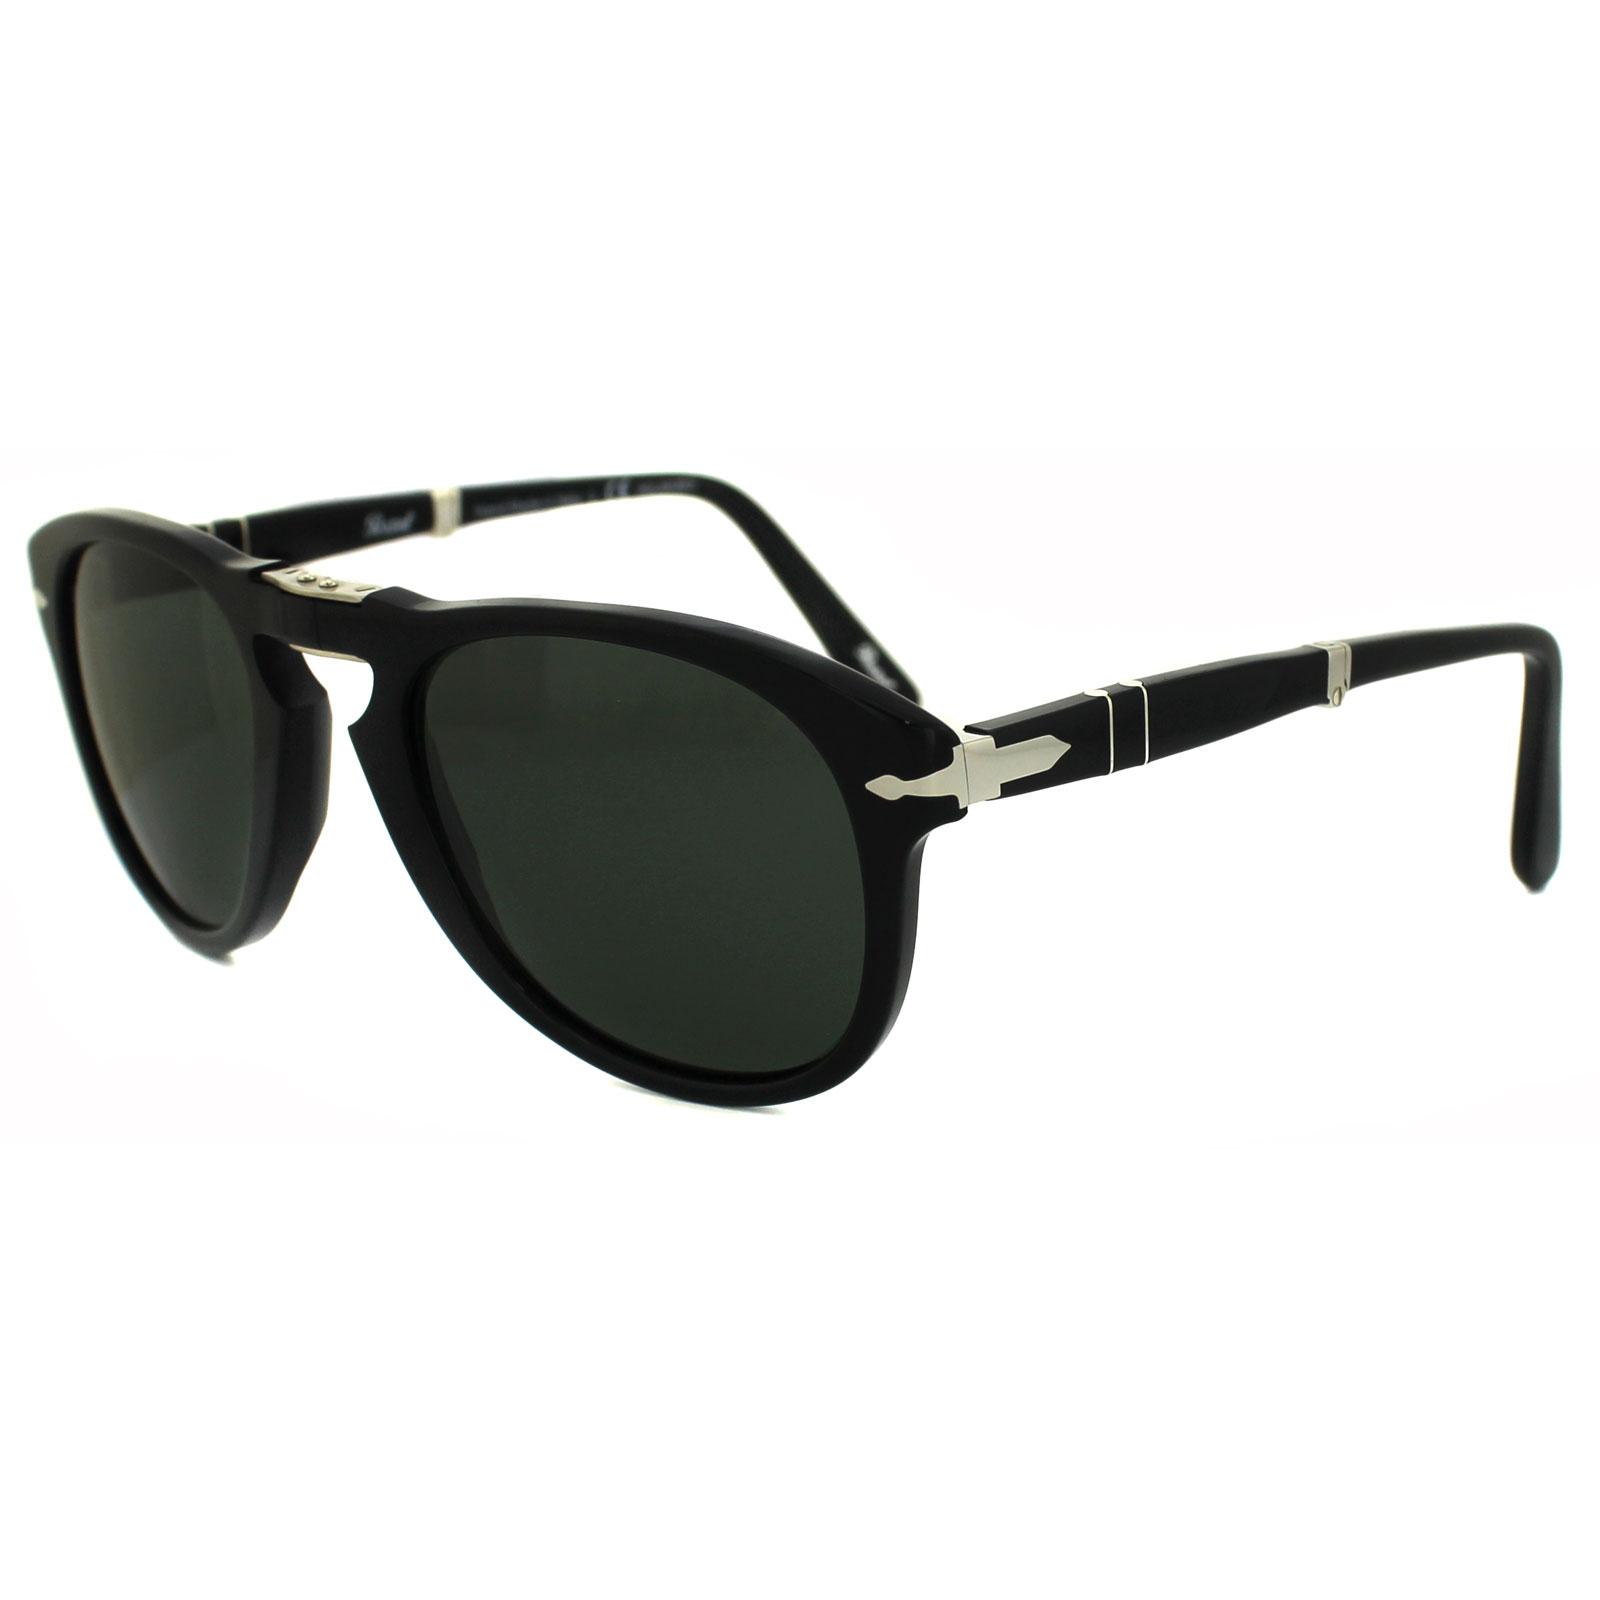 Steve Mcqueen Gafas Polarizado De Sol Verde Persol Detalles 9558 0714 Negro Plegable R4Aj5L